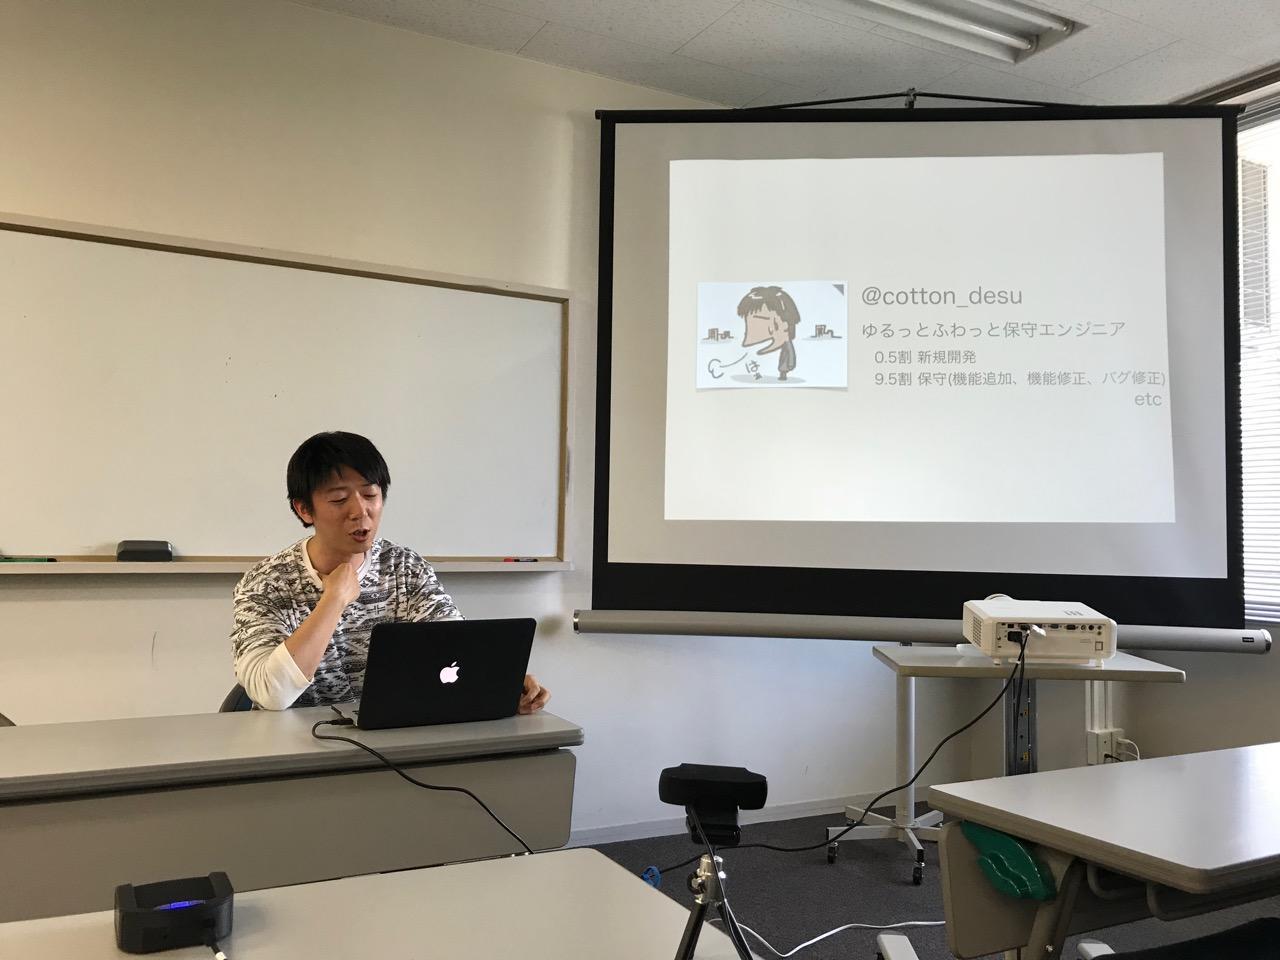 https://el.jibun.atmarkit.co.jp/yutakakn/kzrb04.jpg